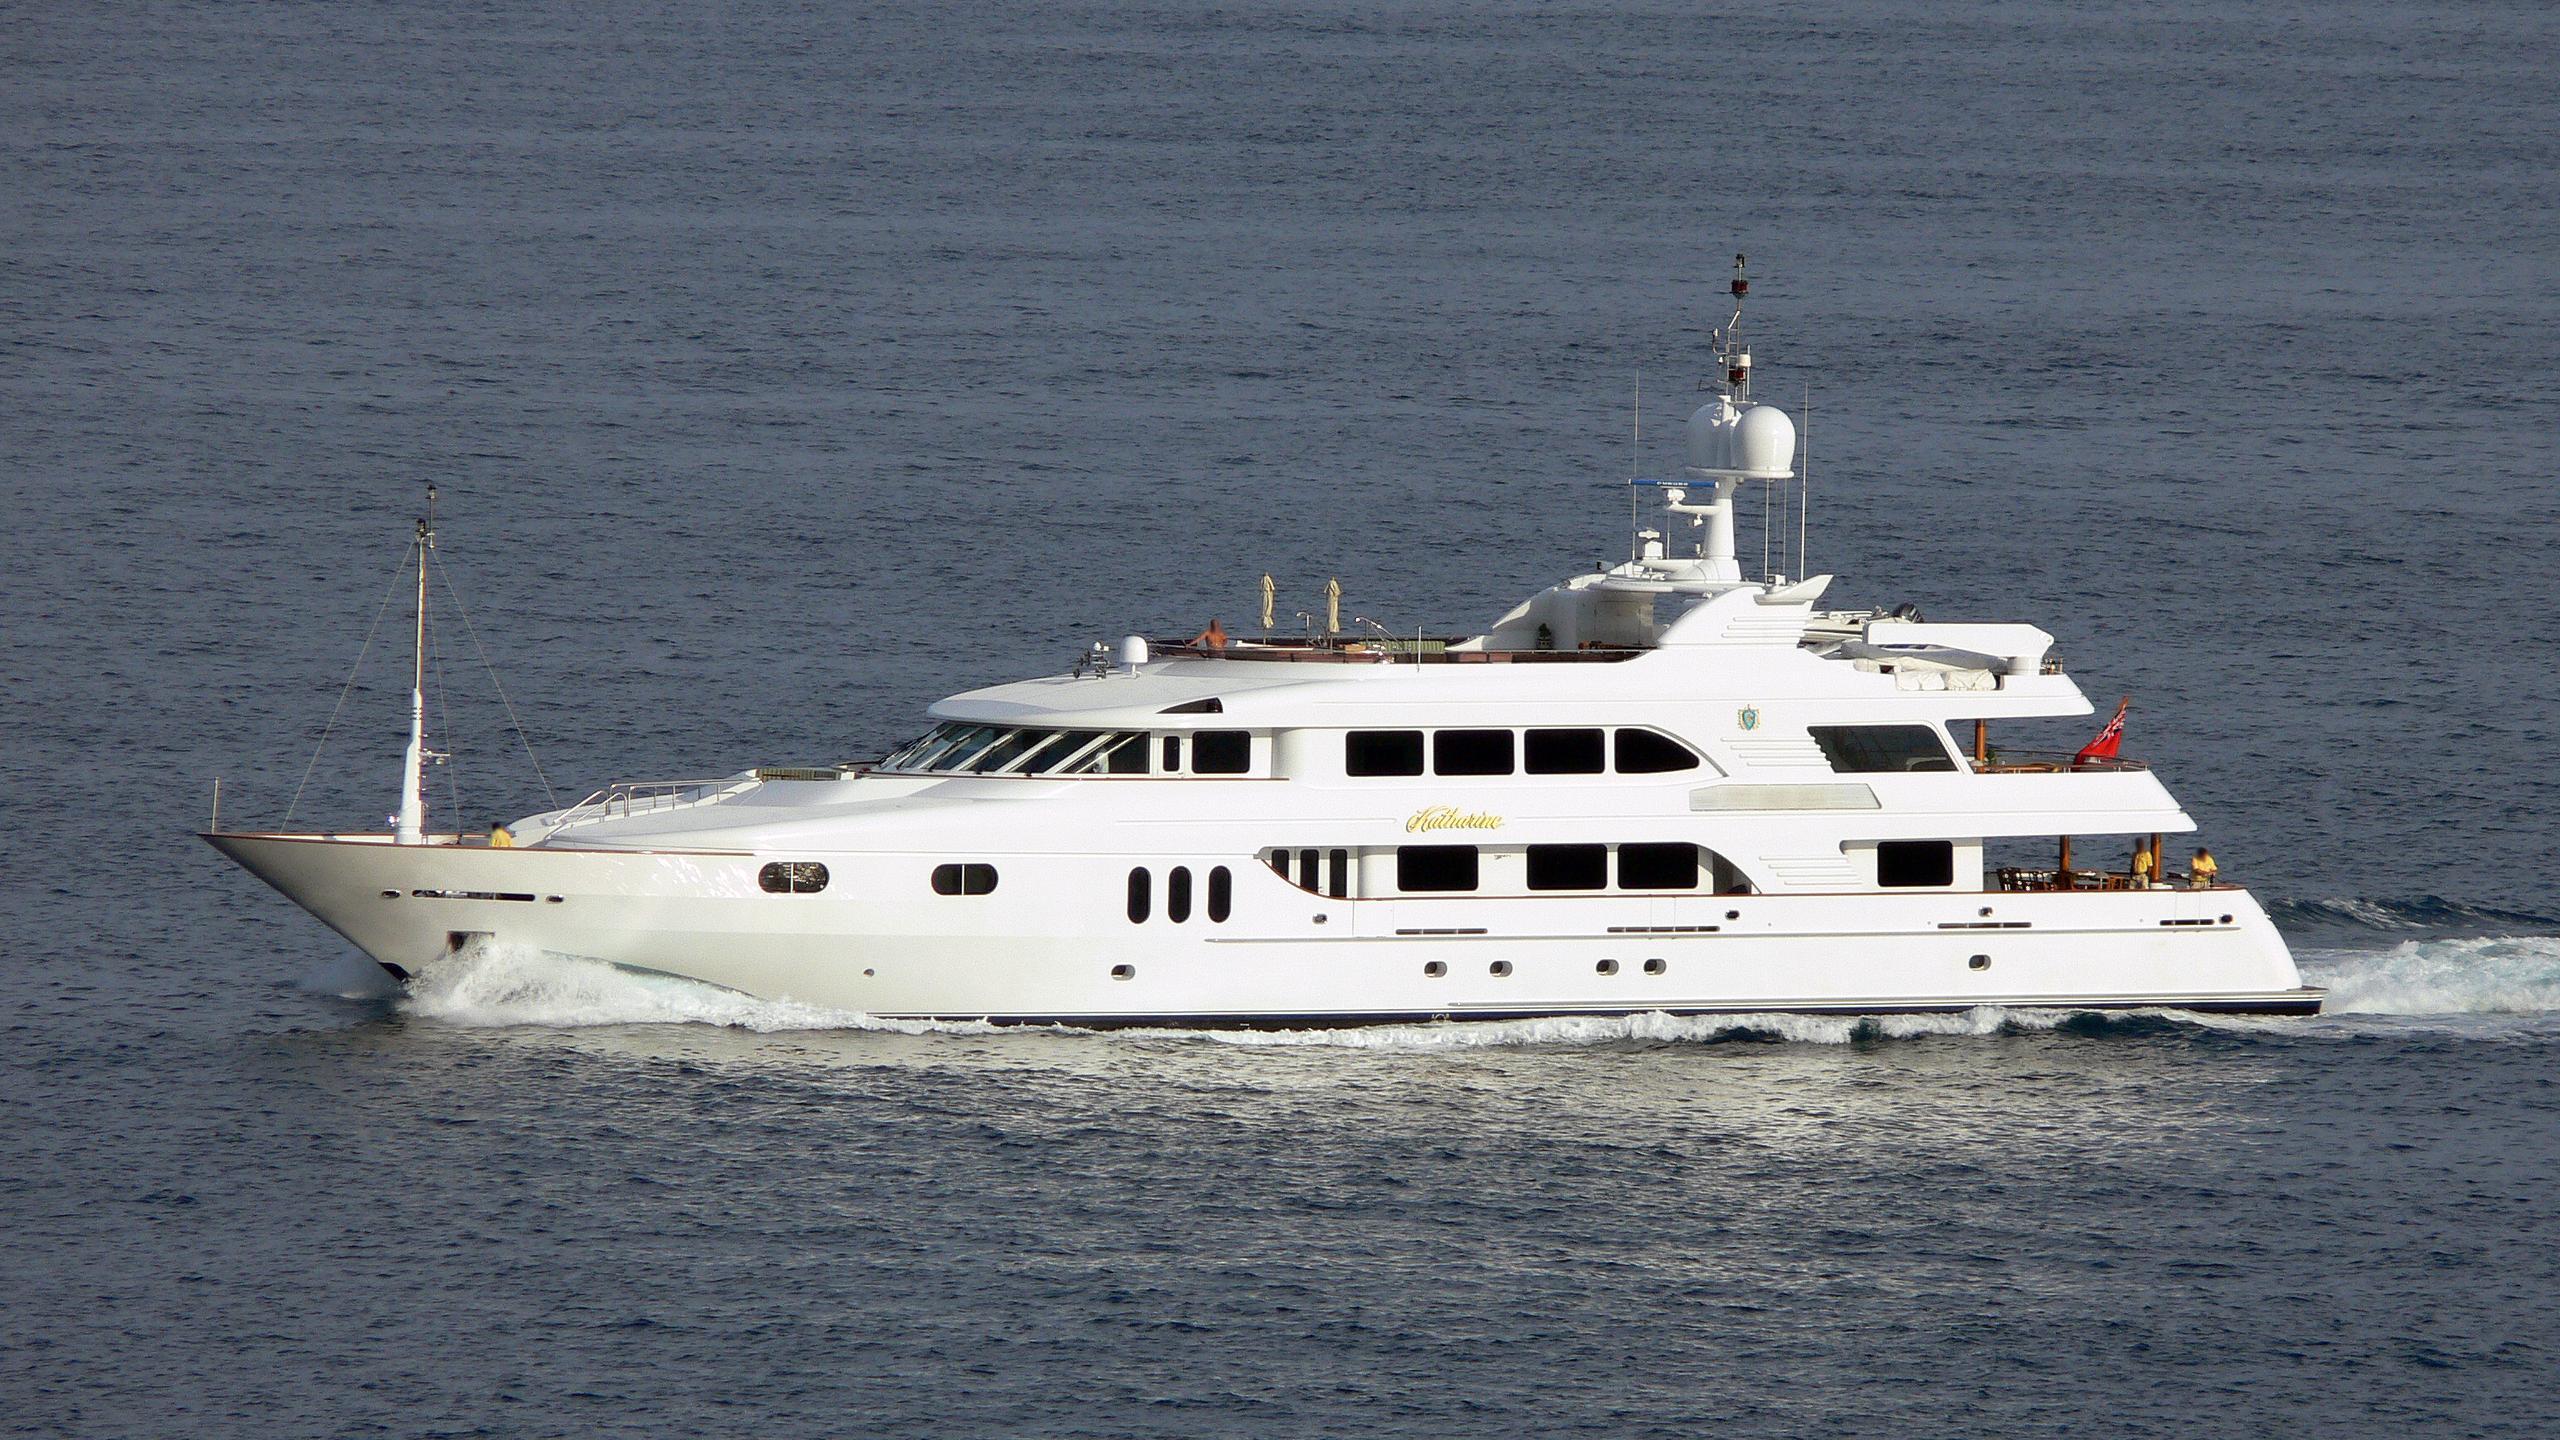 keri-lee-iii-motor-yacht-trinity-2001-54m-before-refit-profile